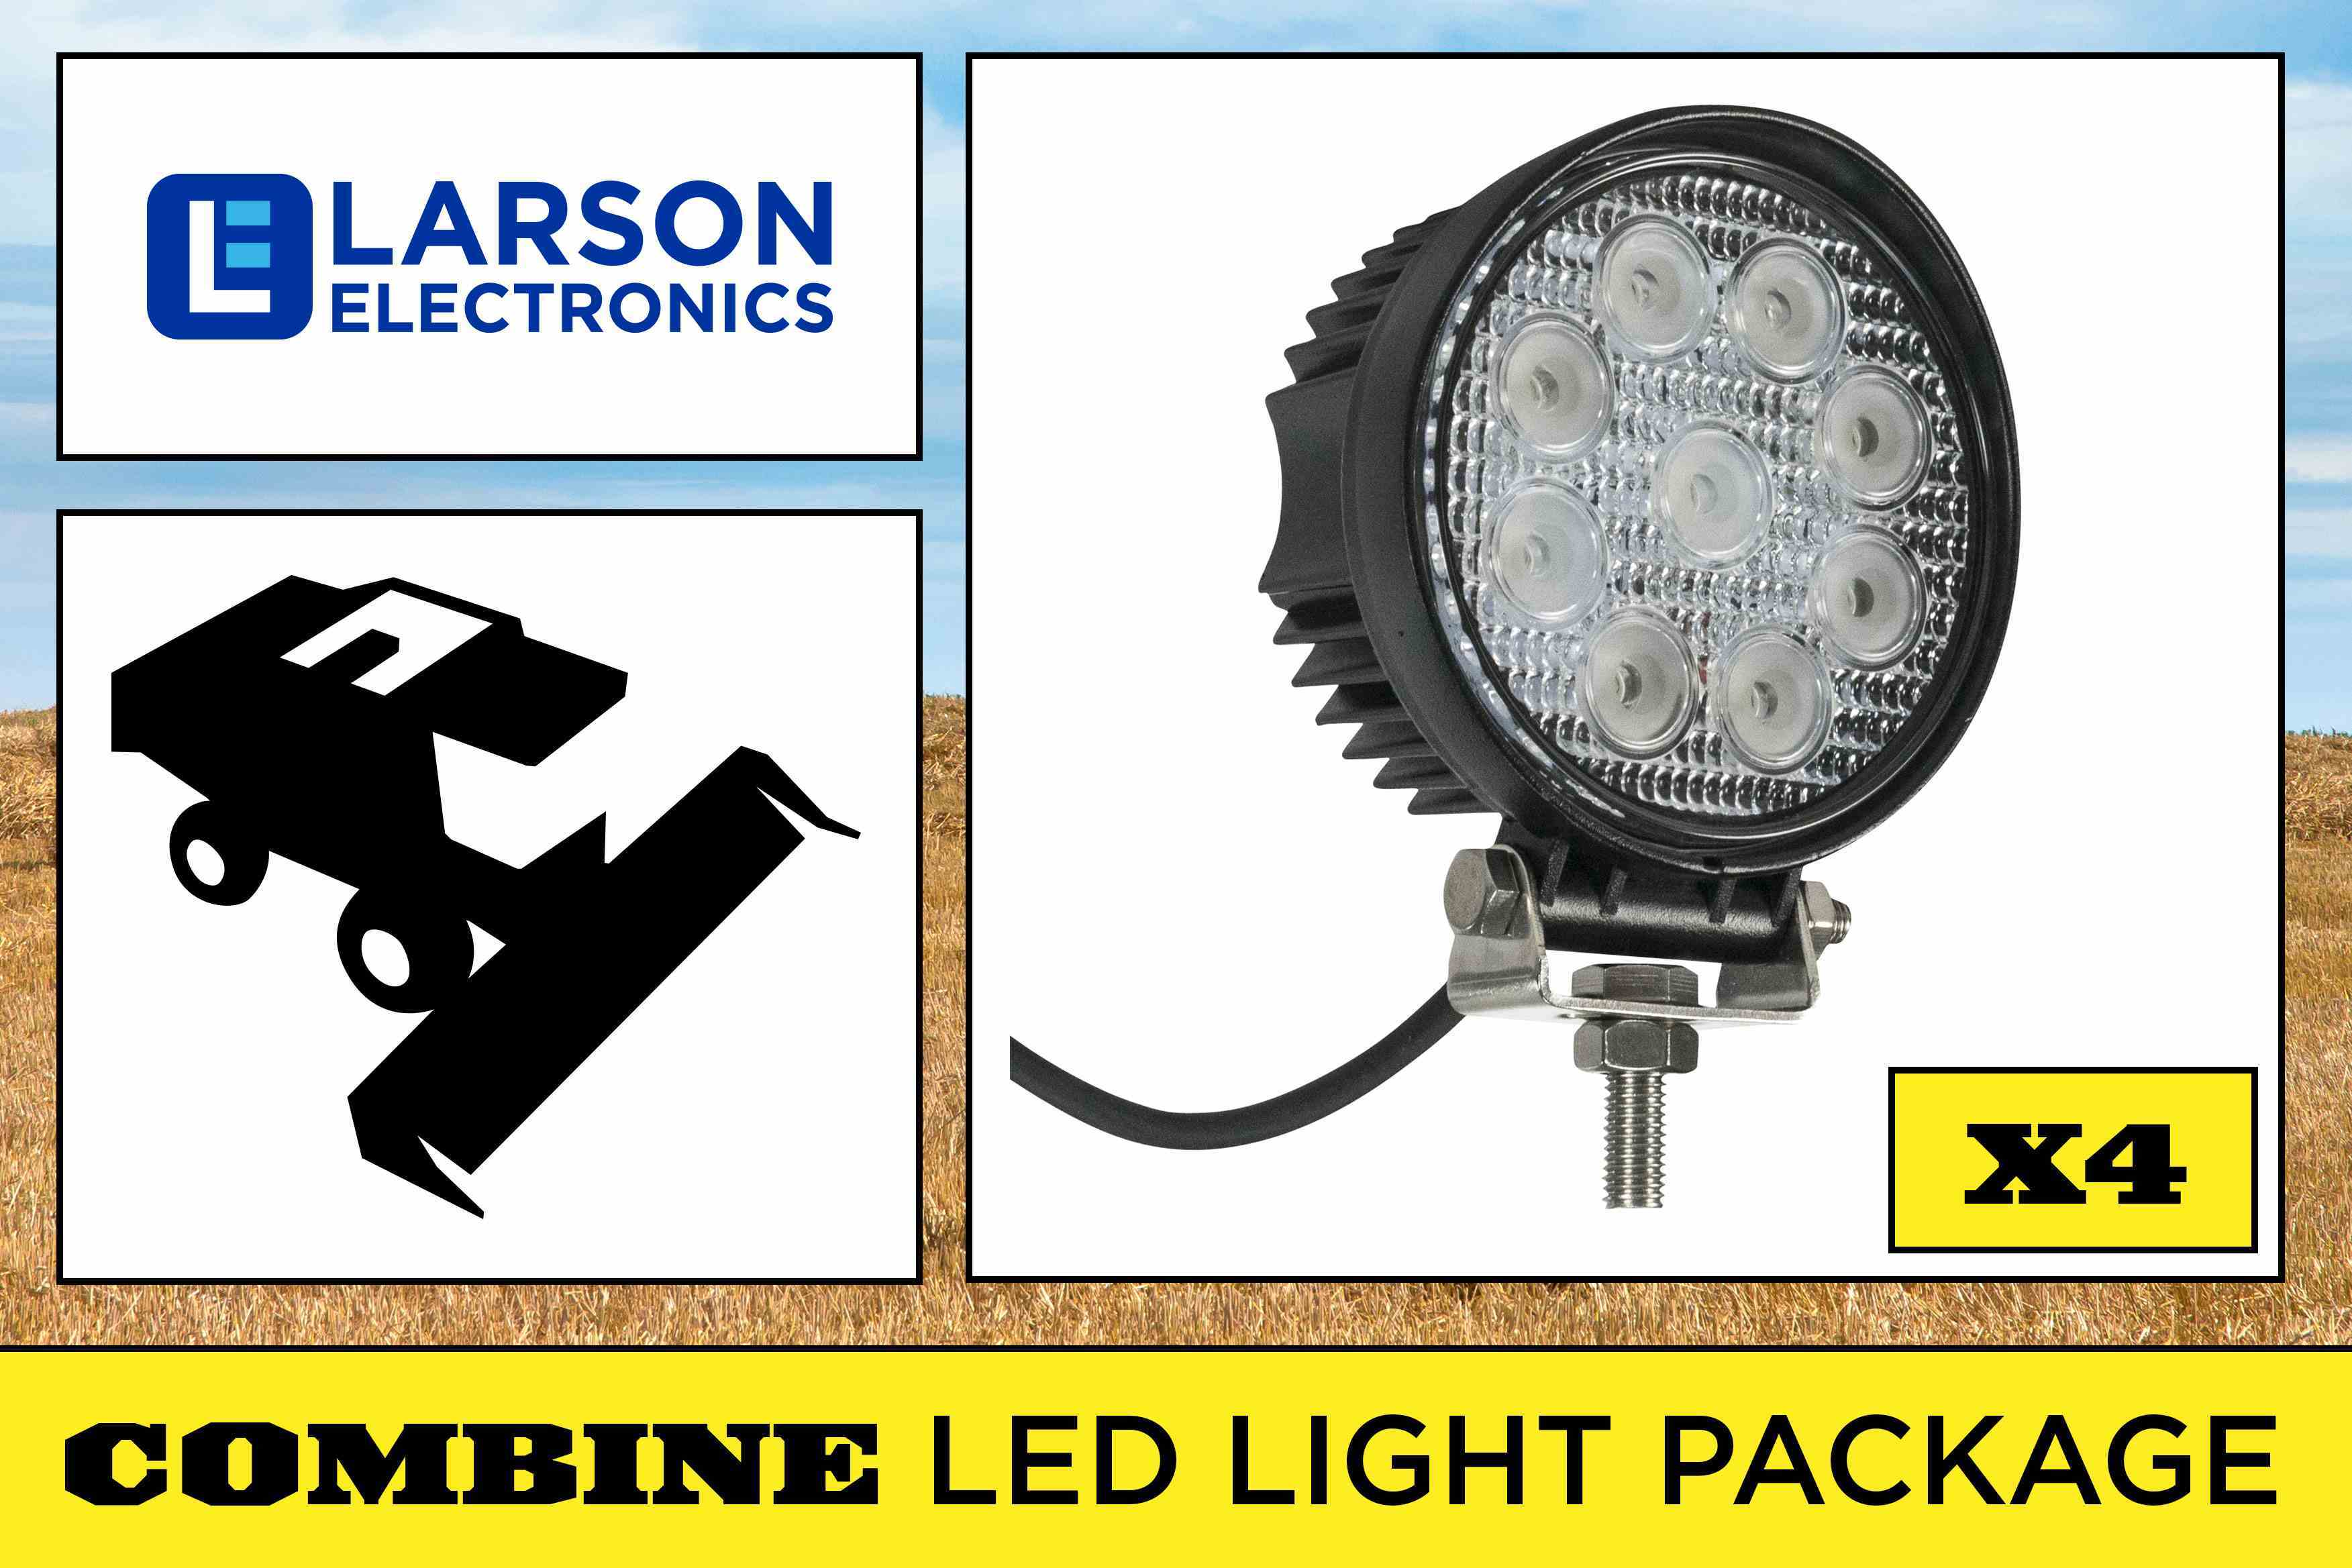 Case Ih Combine Grain Tank Amp Unloader Headlight Led